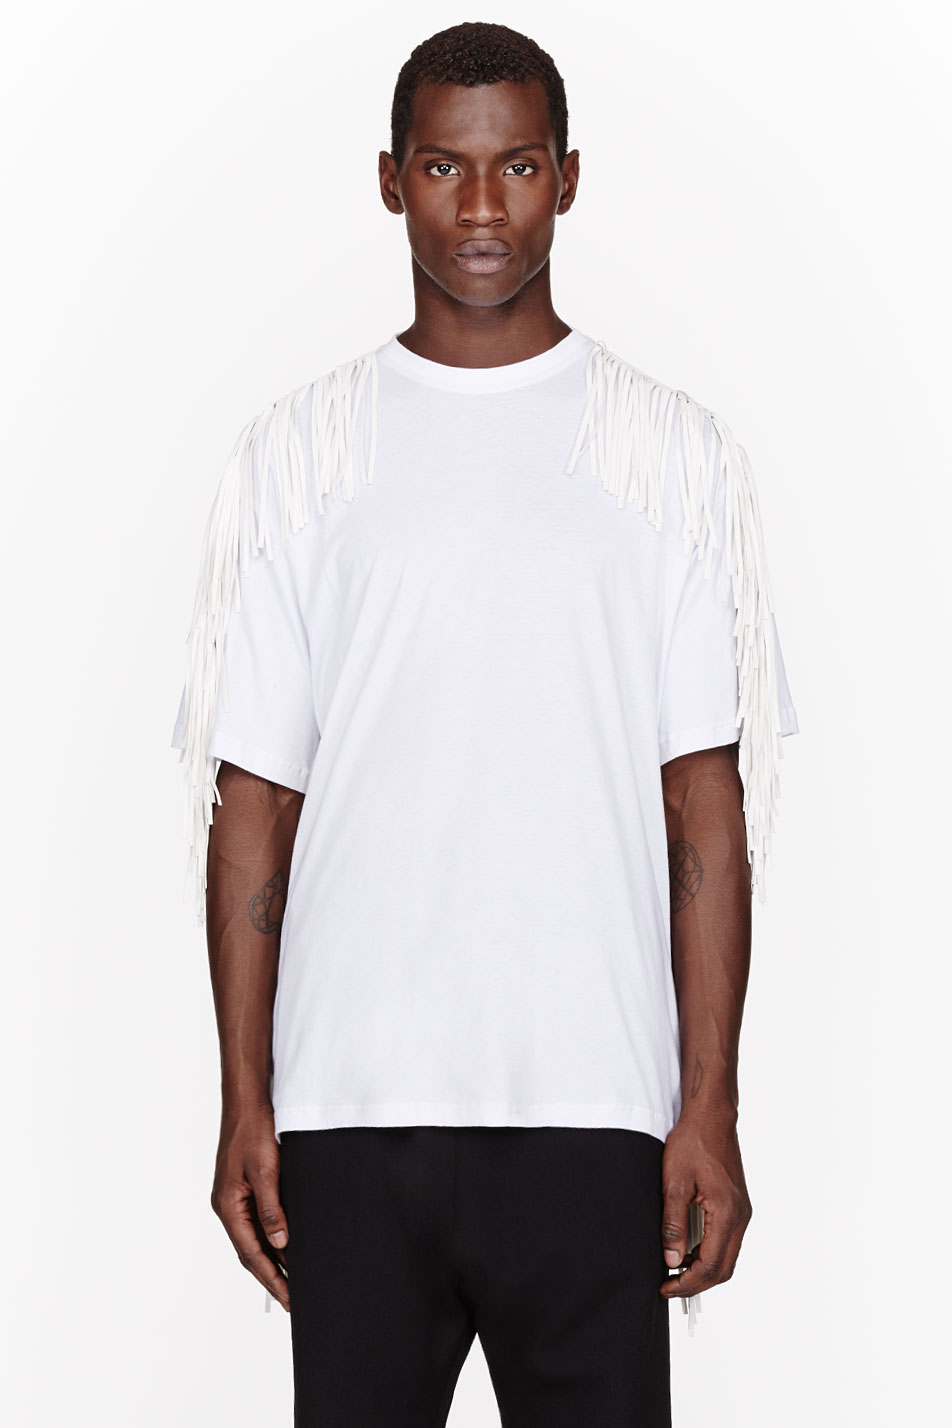 ktz white fringed t shirt in beige for men white lyst. Black Bedroom Furniture Sets. Home Design Ideas